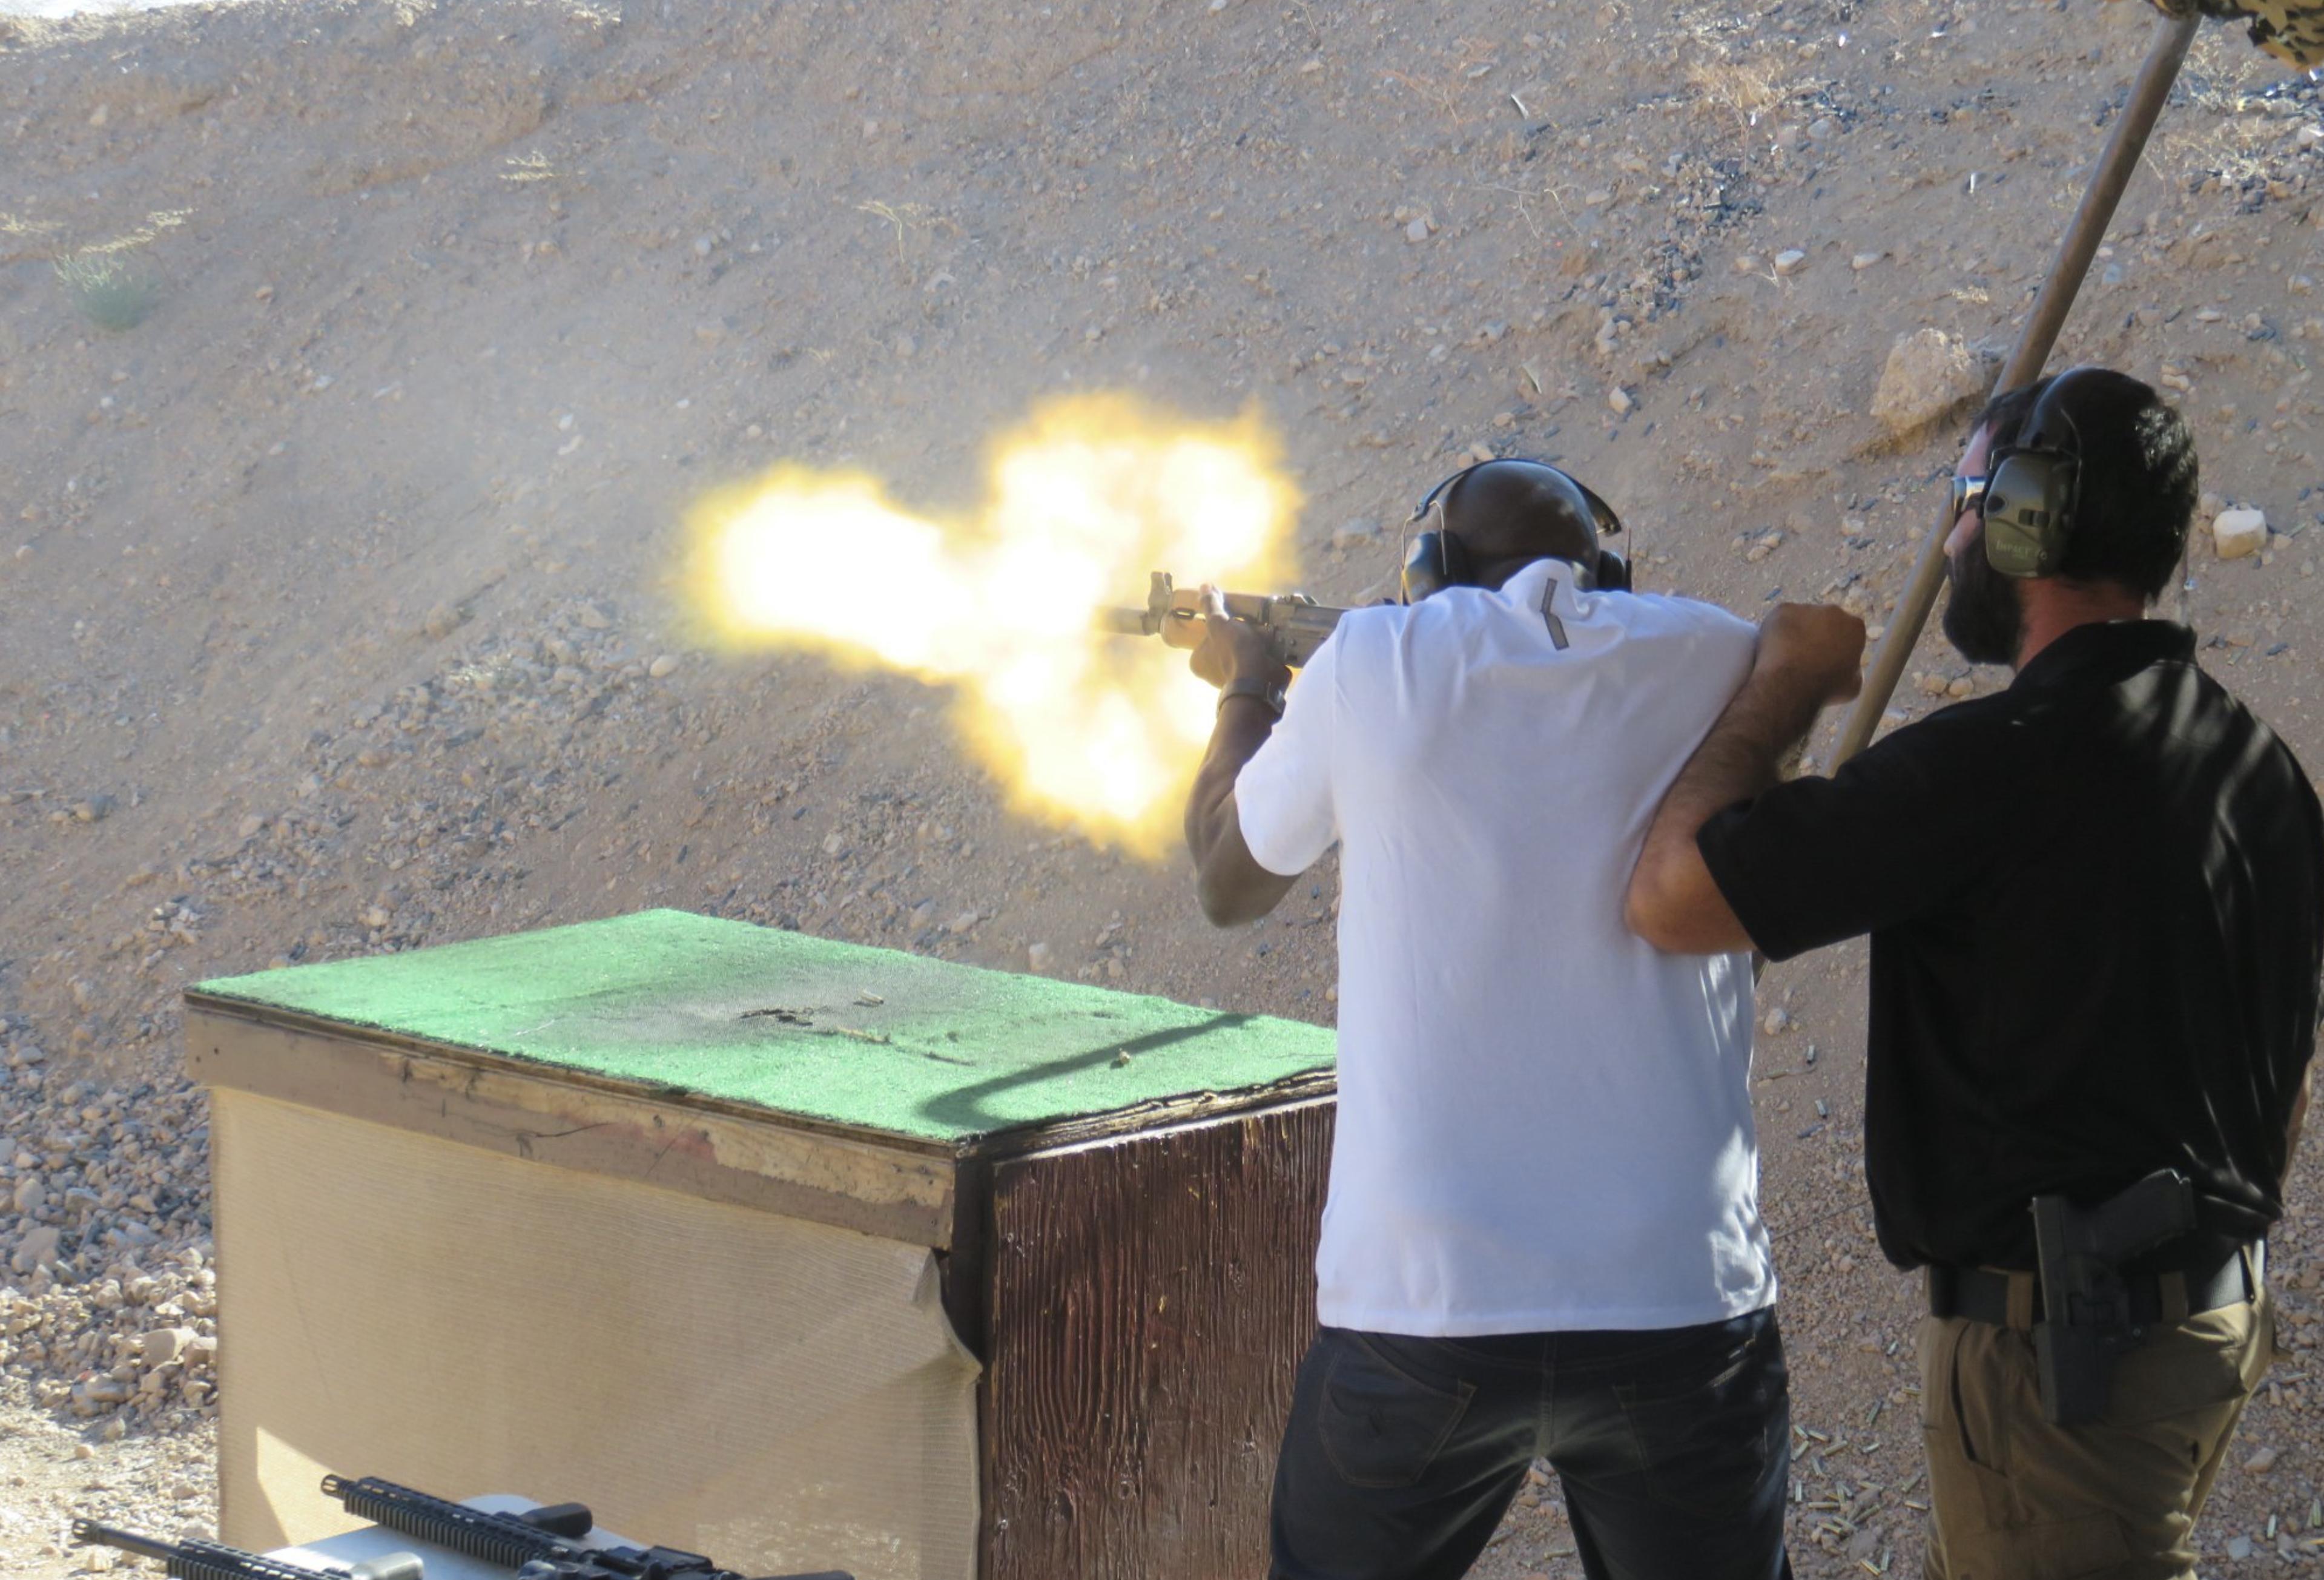 AK-47 Krink Full Auto